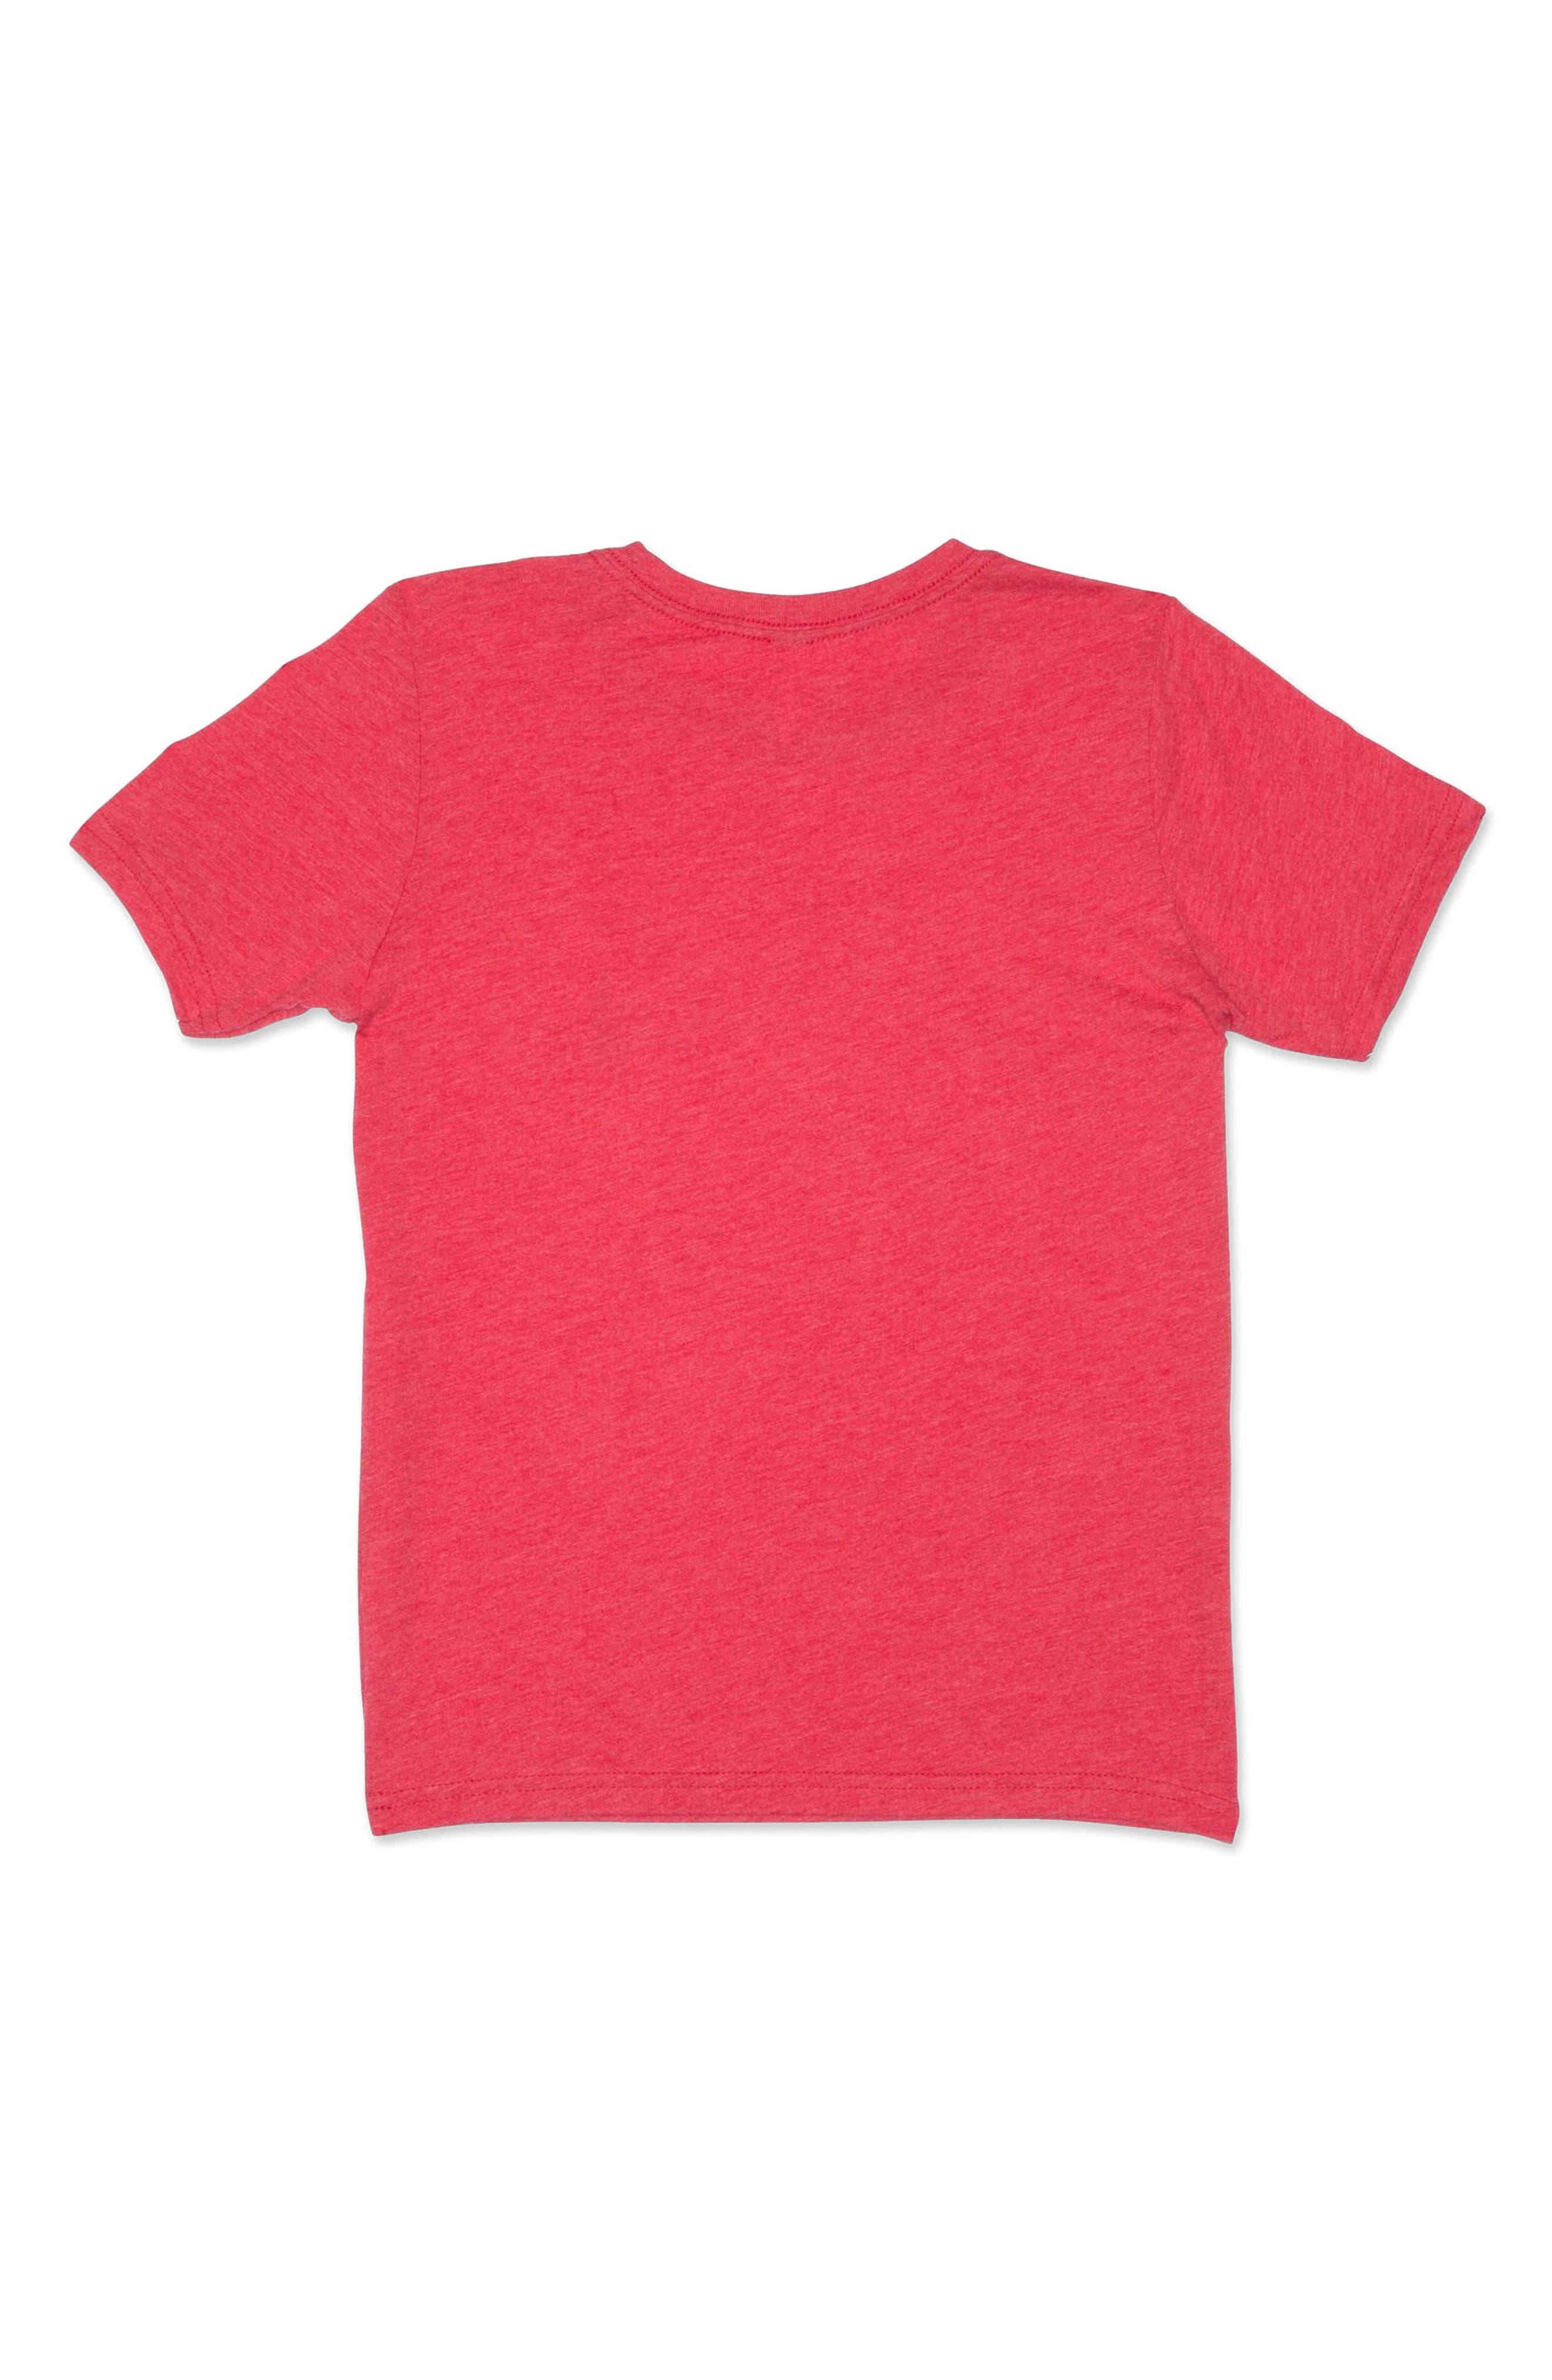 Greer Graphic T-Shirt,                             Alternate thumbnail 2, color,                             Malibu Red